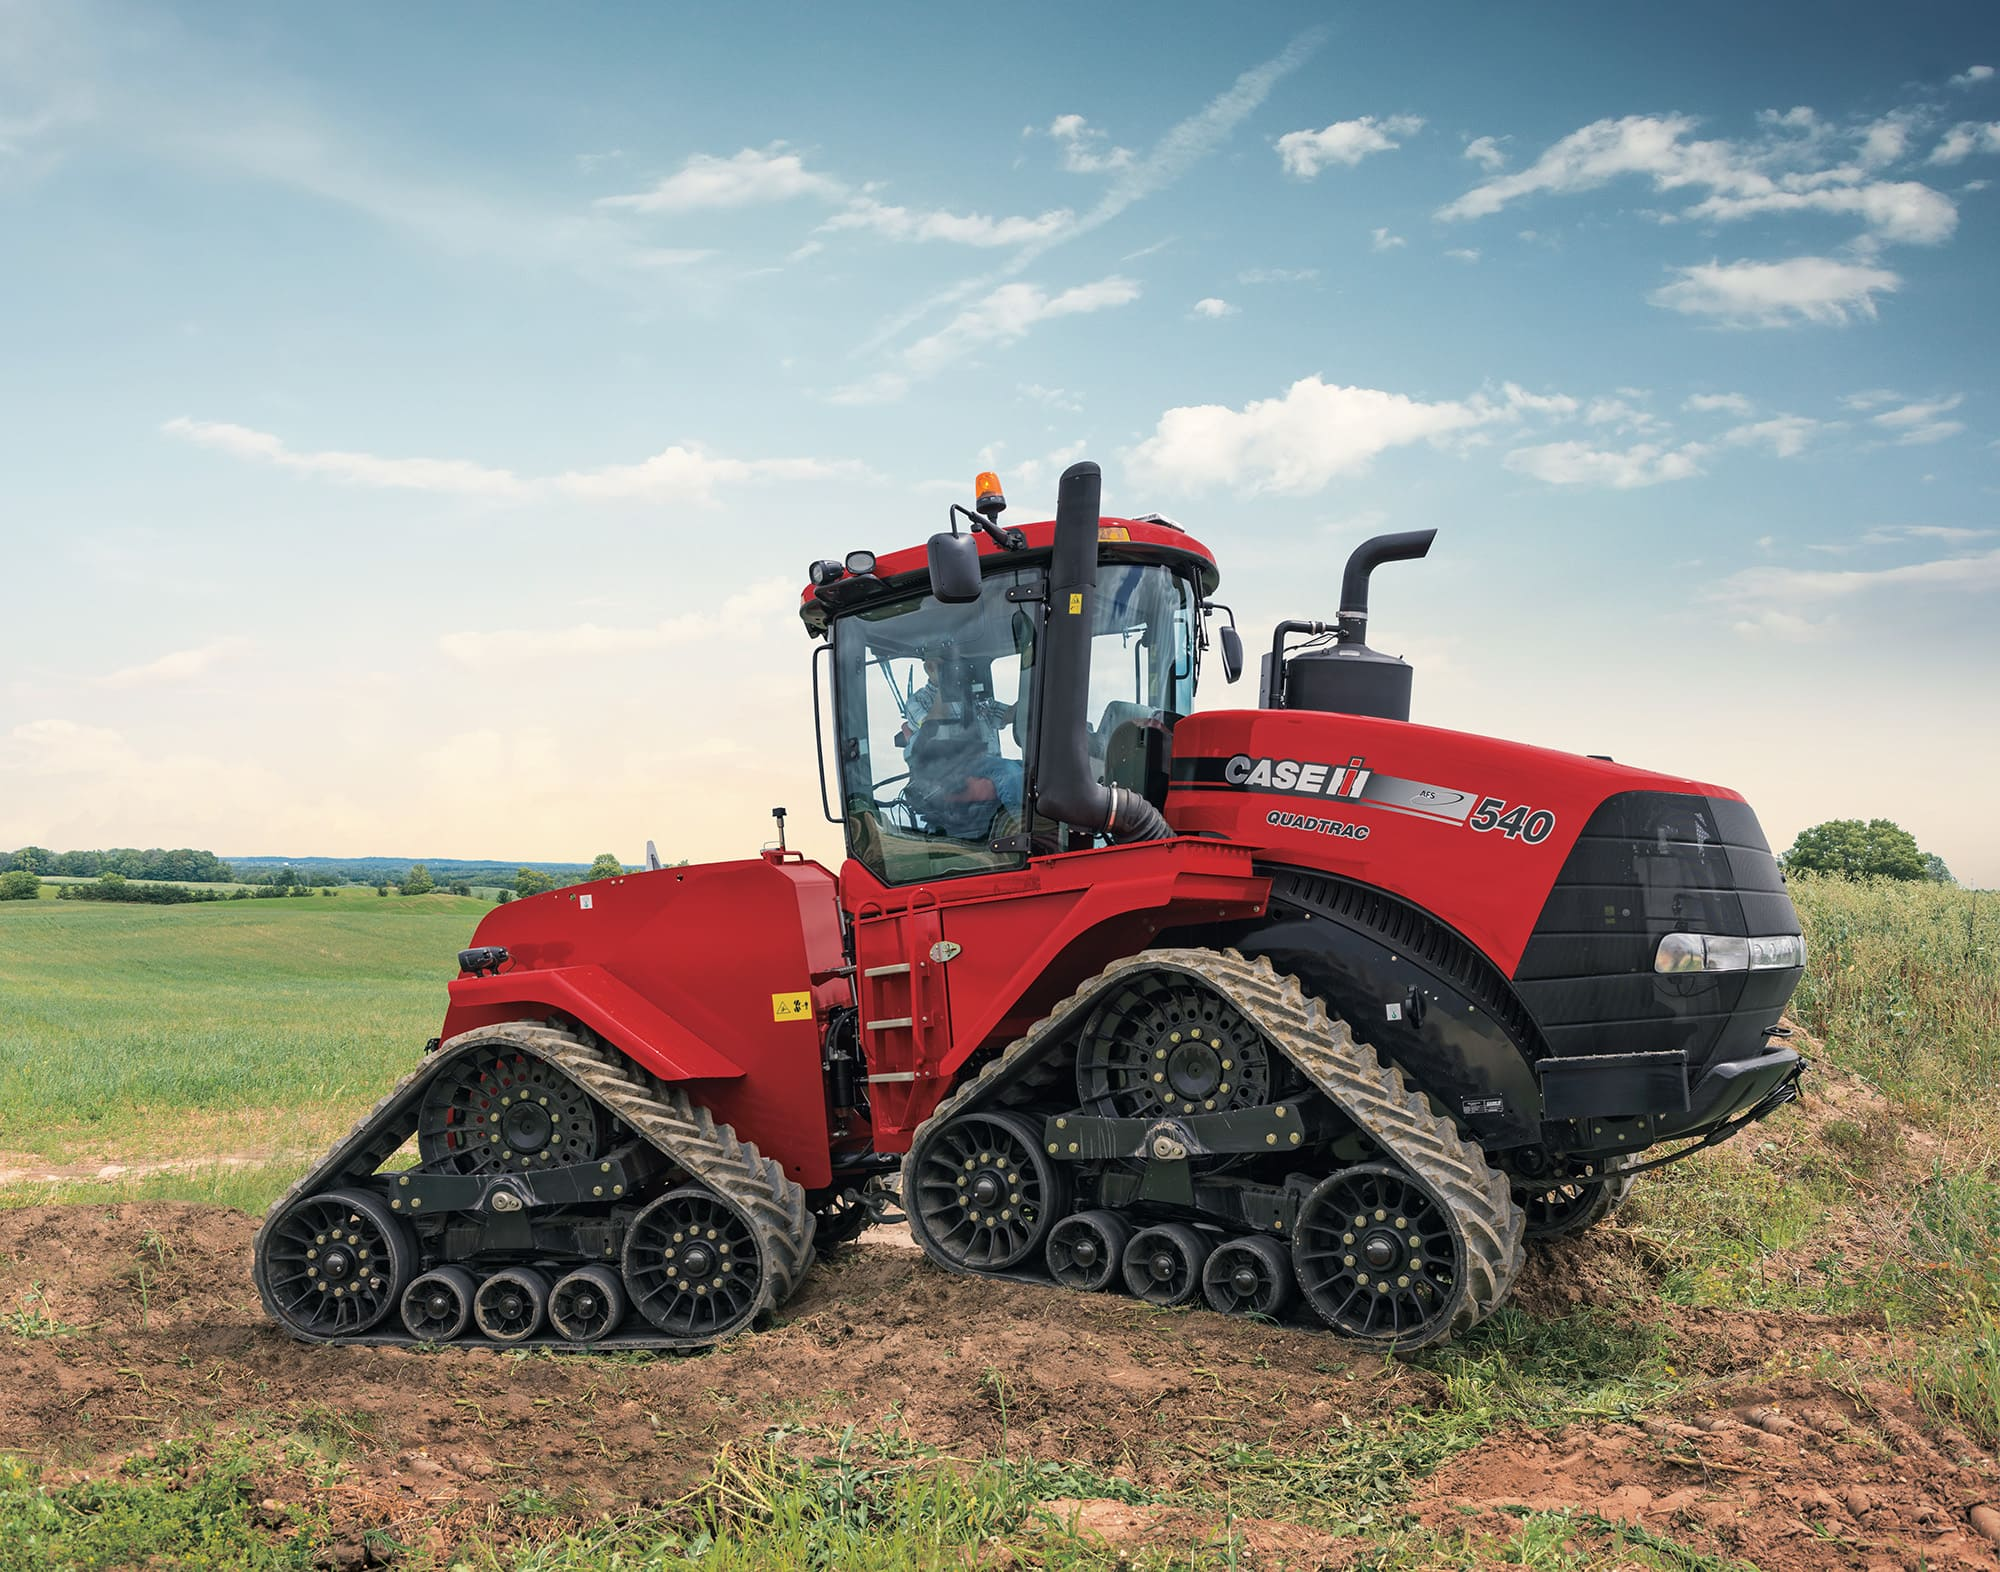 steiger_quadtrac_540_0713_mim 0576?width=1280&height=562 steiger series 4wd row crop farming tractors case ih  at mifinder.co